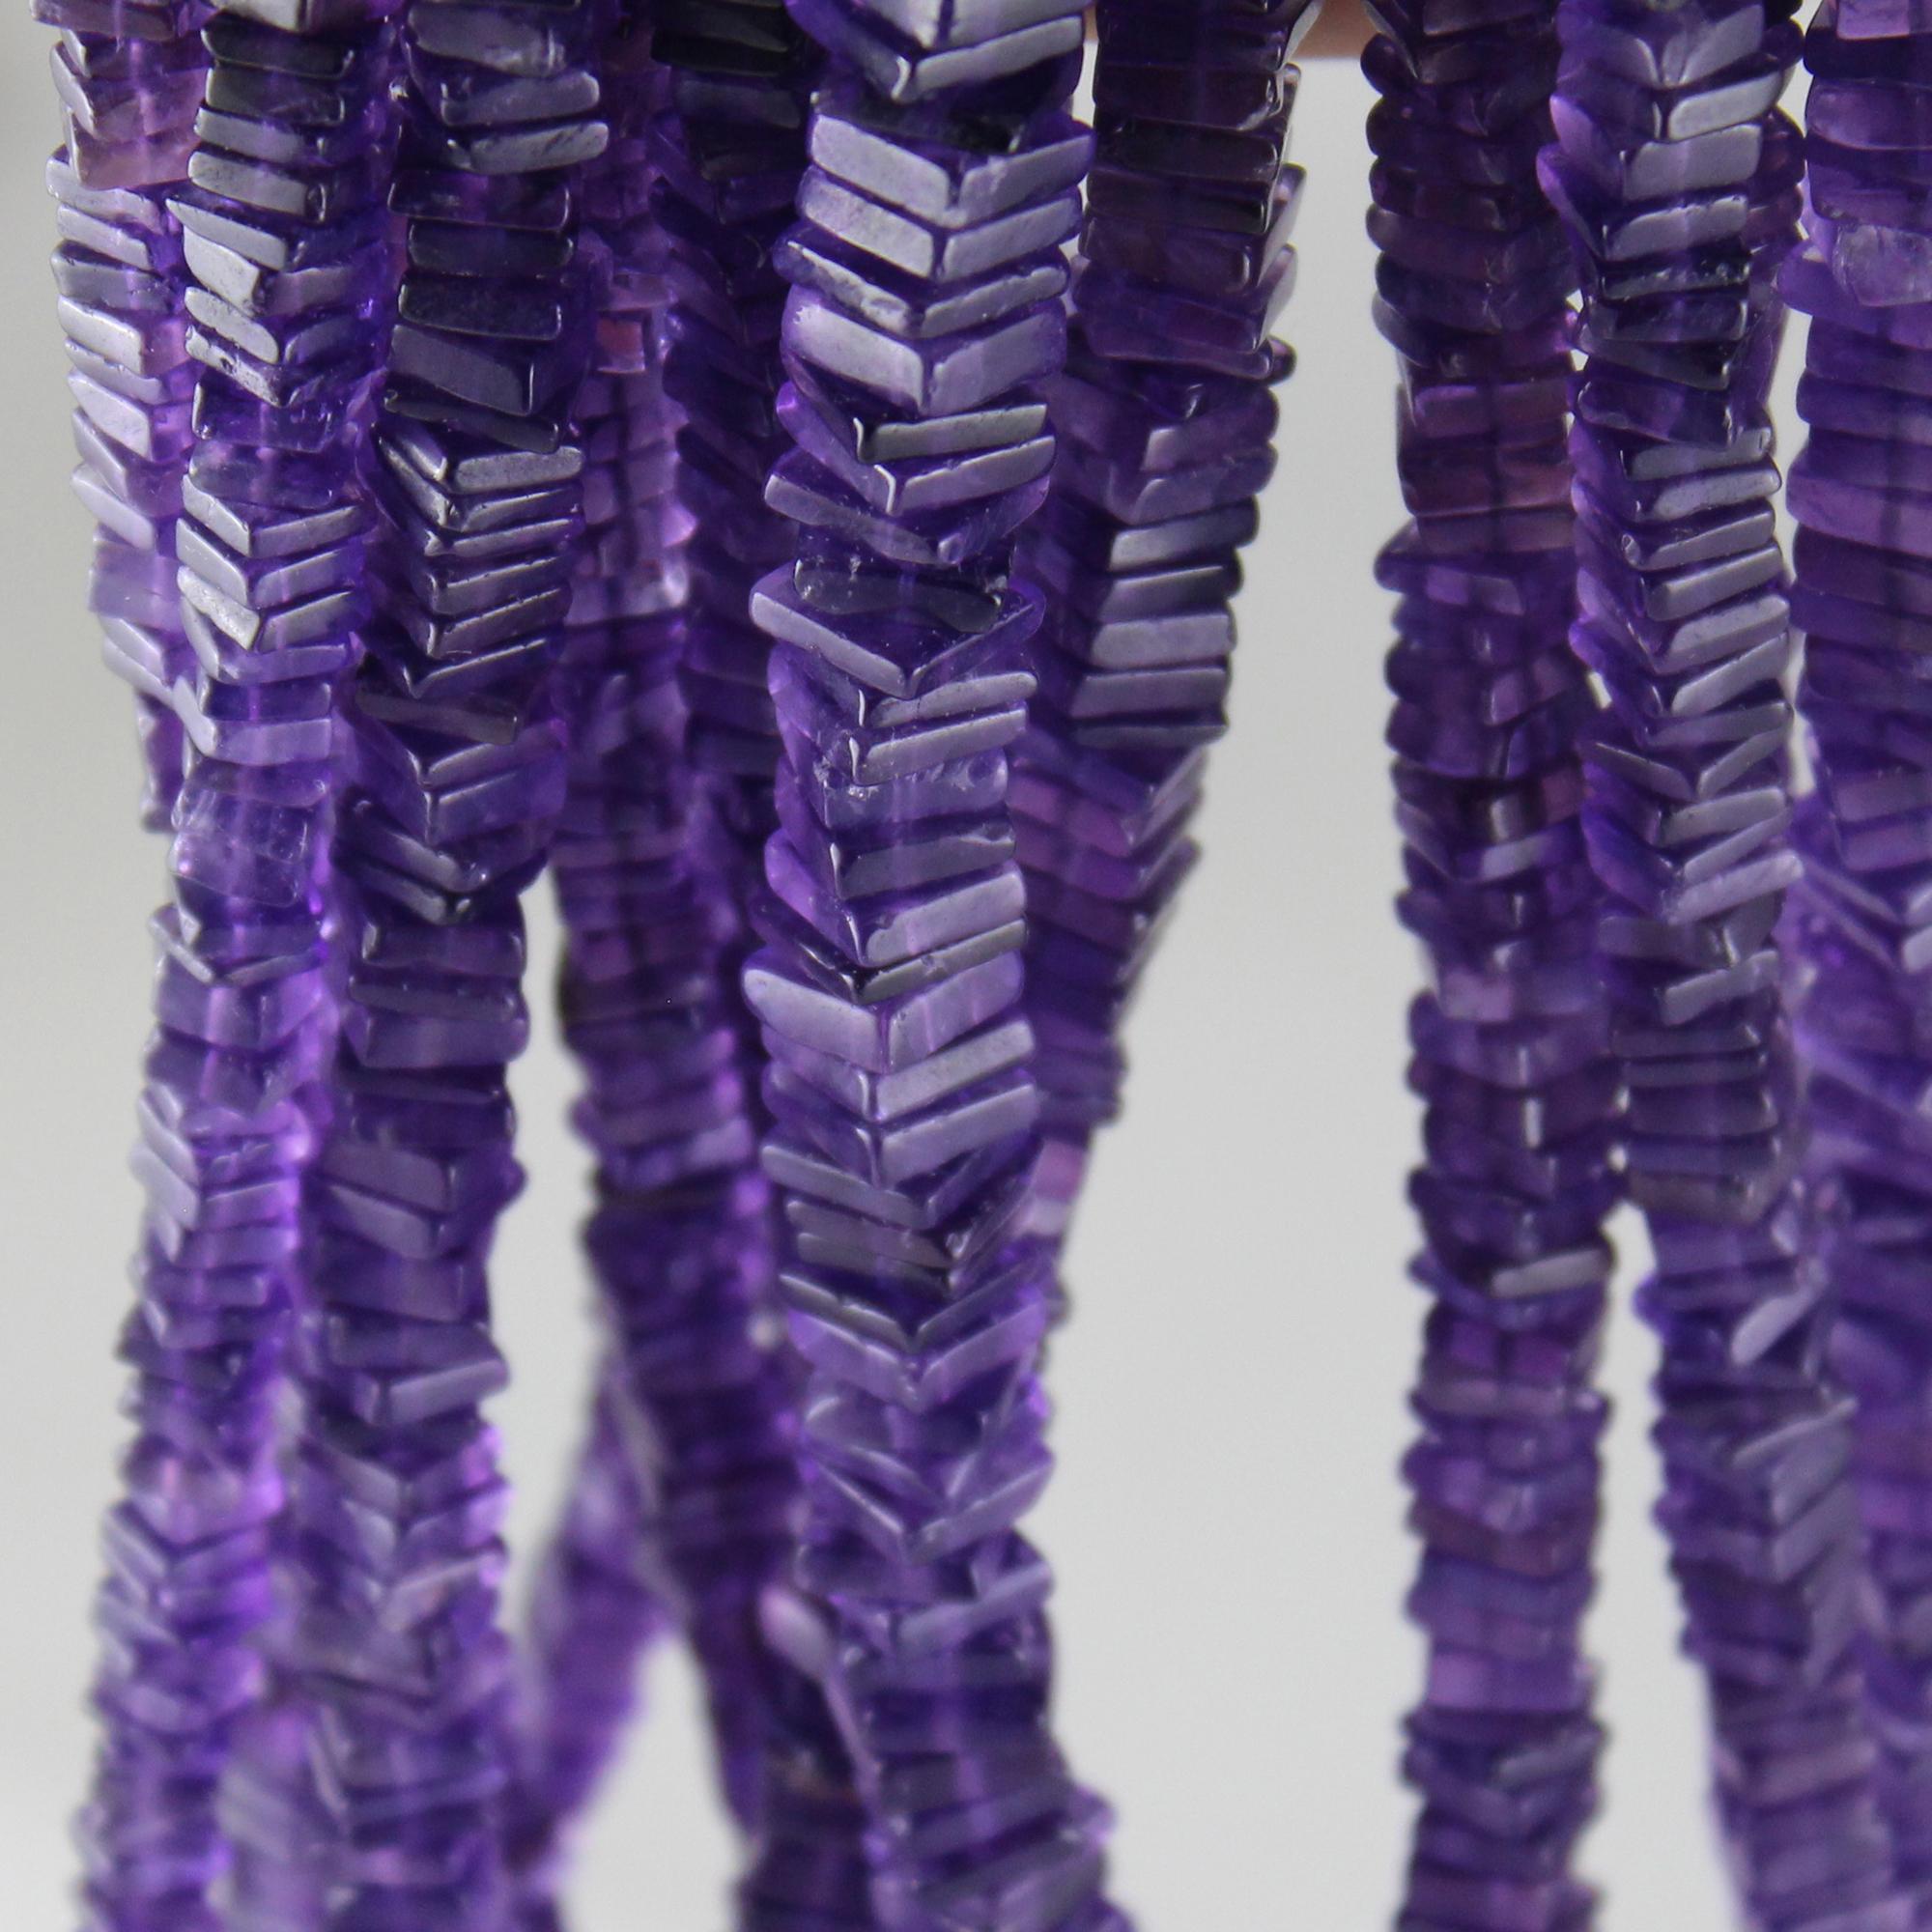 Amethyst Square Beads